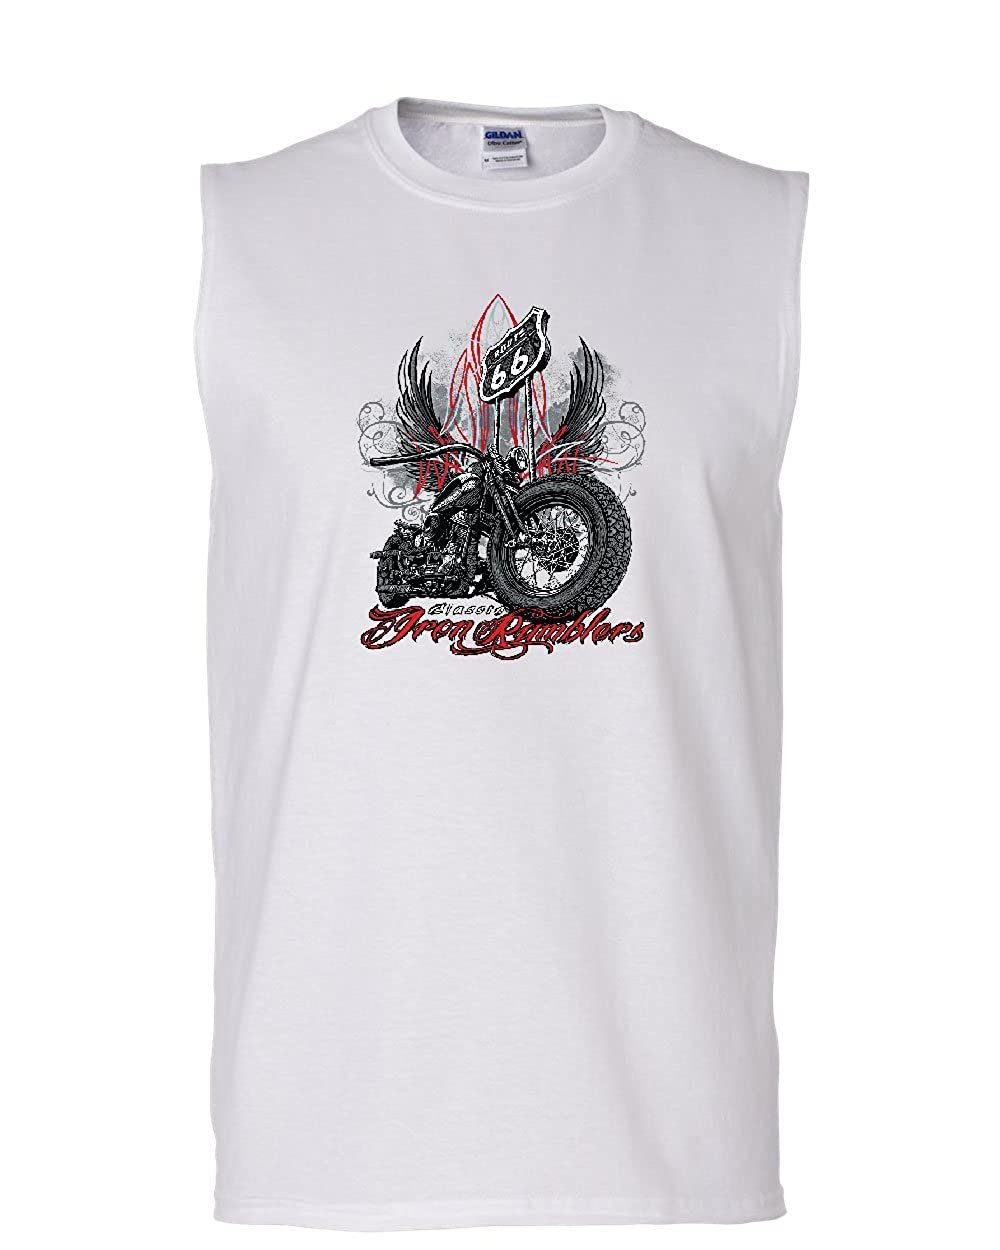 Route 66 Classic Iron Rumblers Muscle Shirt Chopper Bobber Biker MC Sleeveless